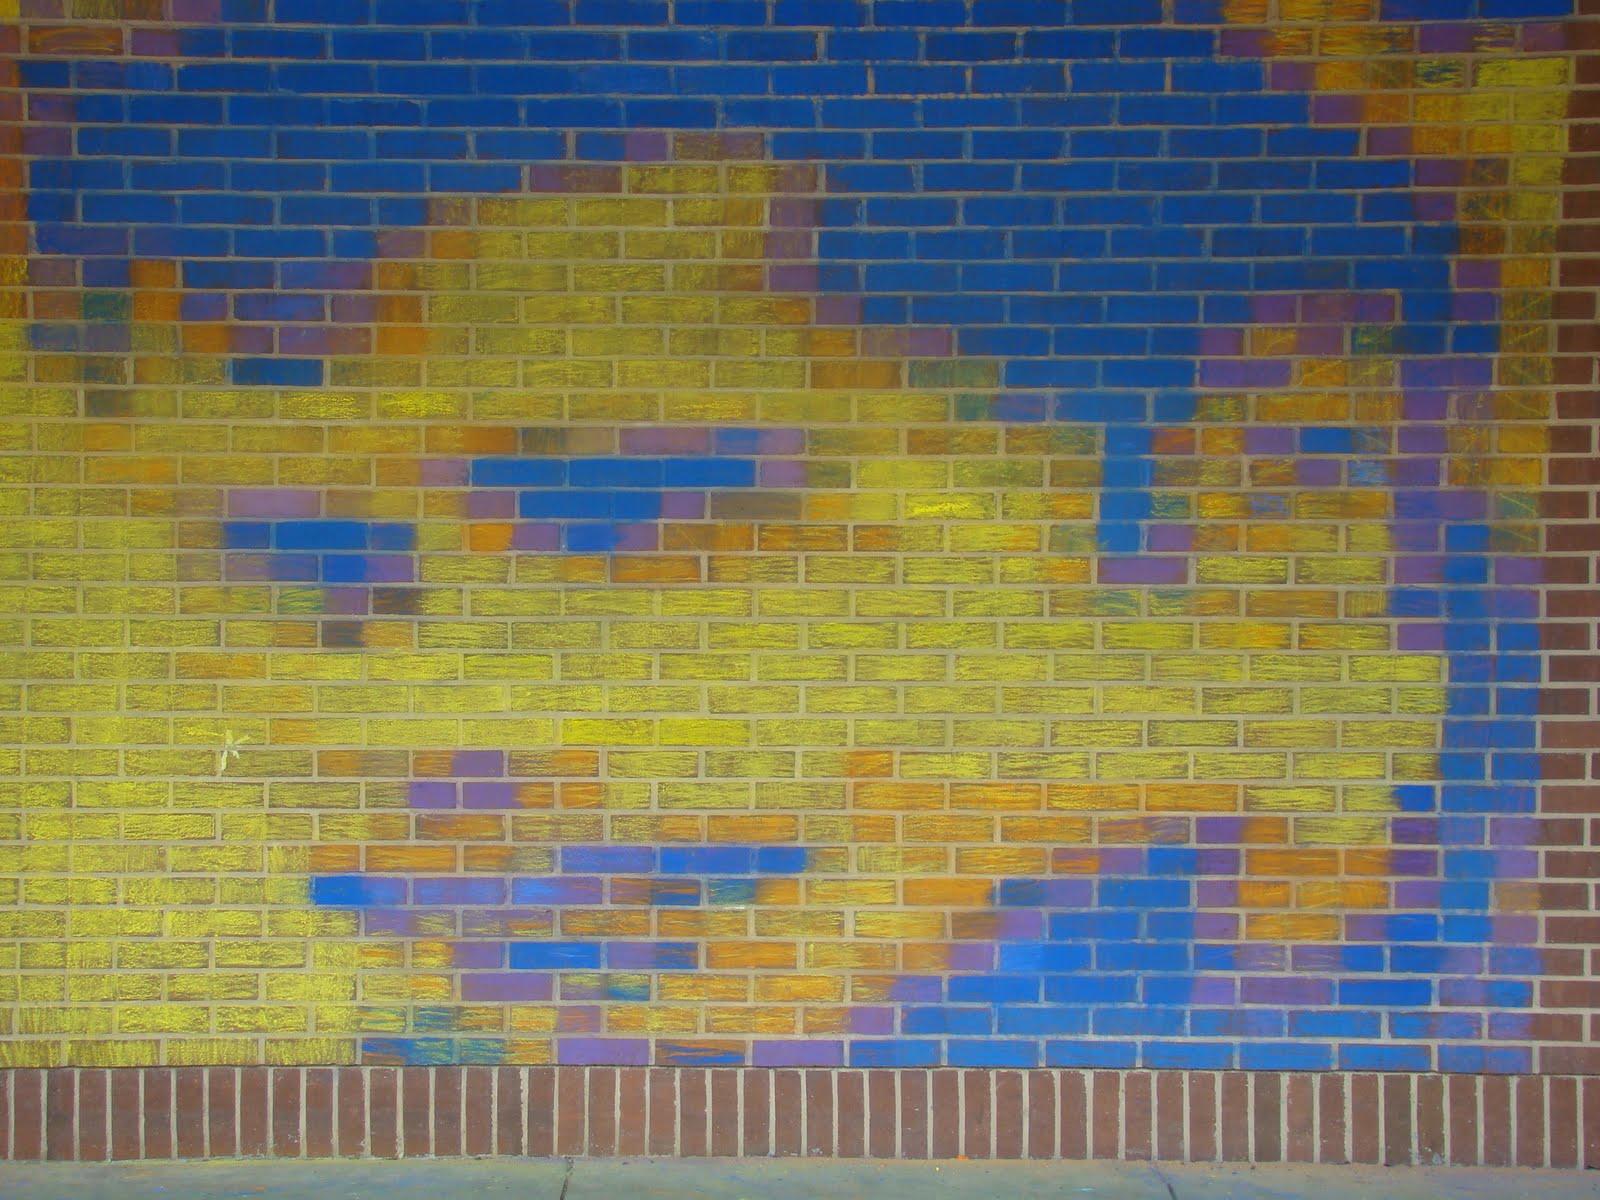 Art of Apex High School: Turning Bricks into Pixels